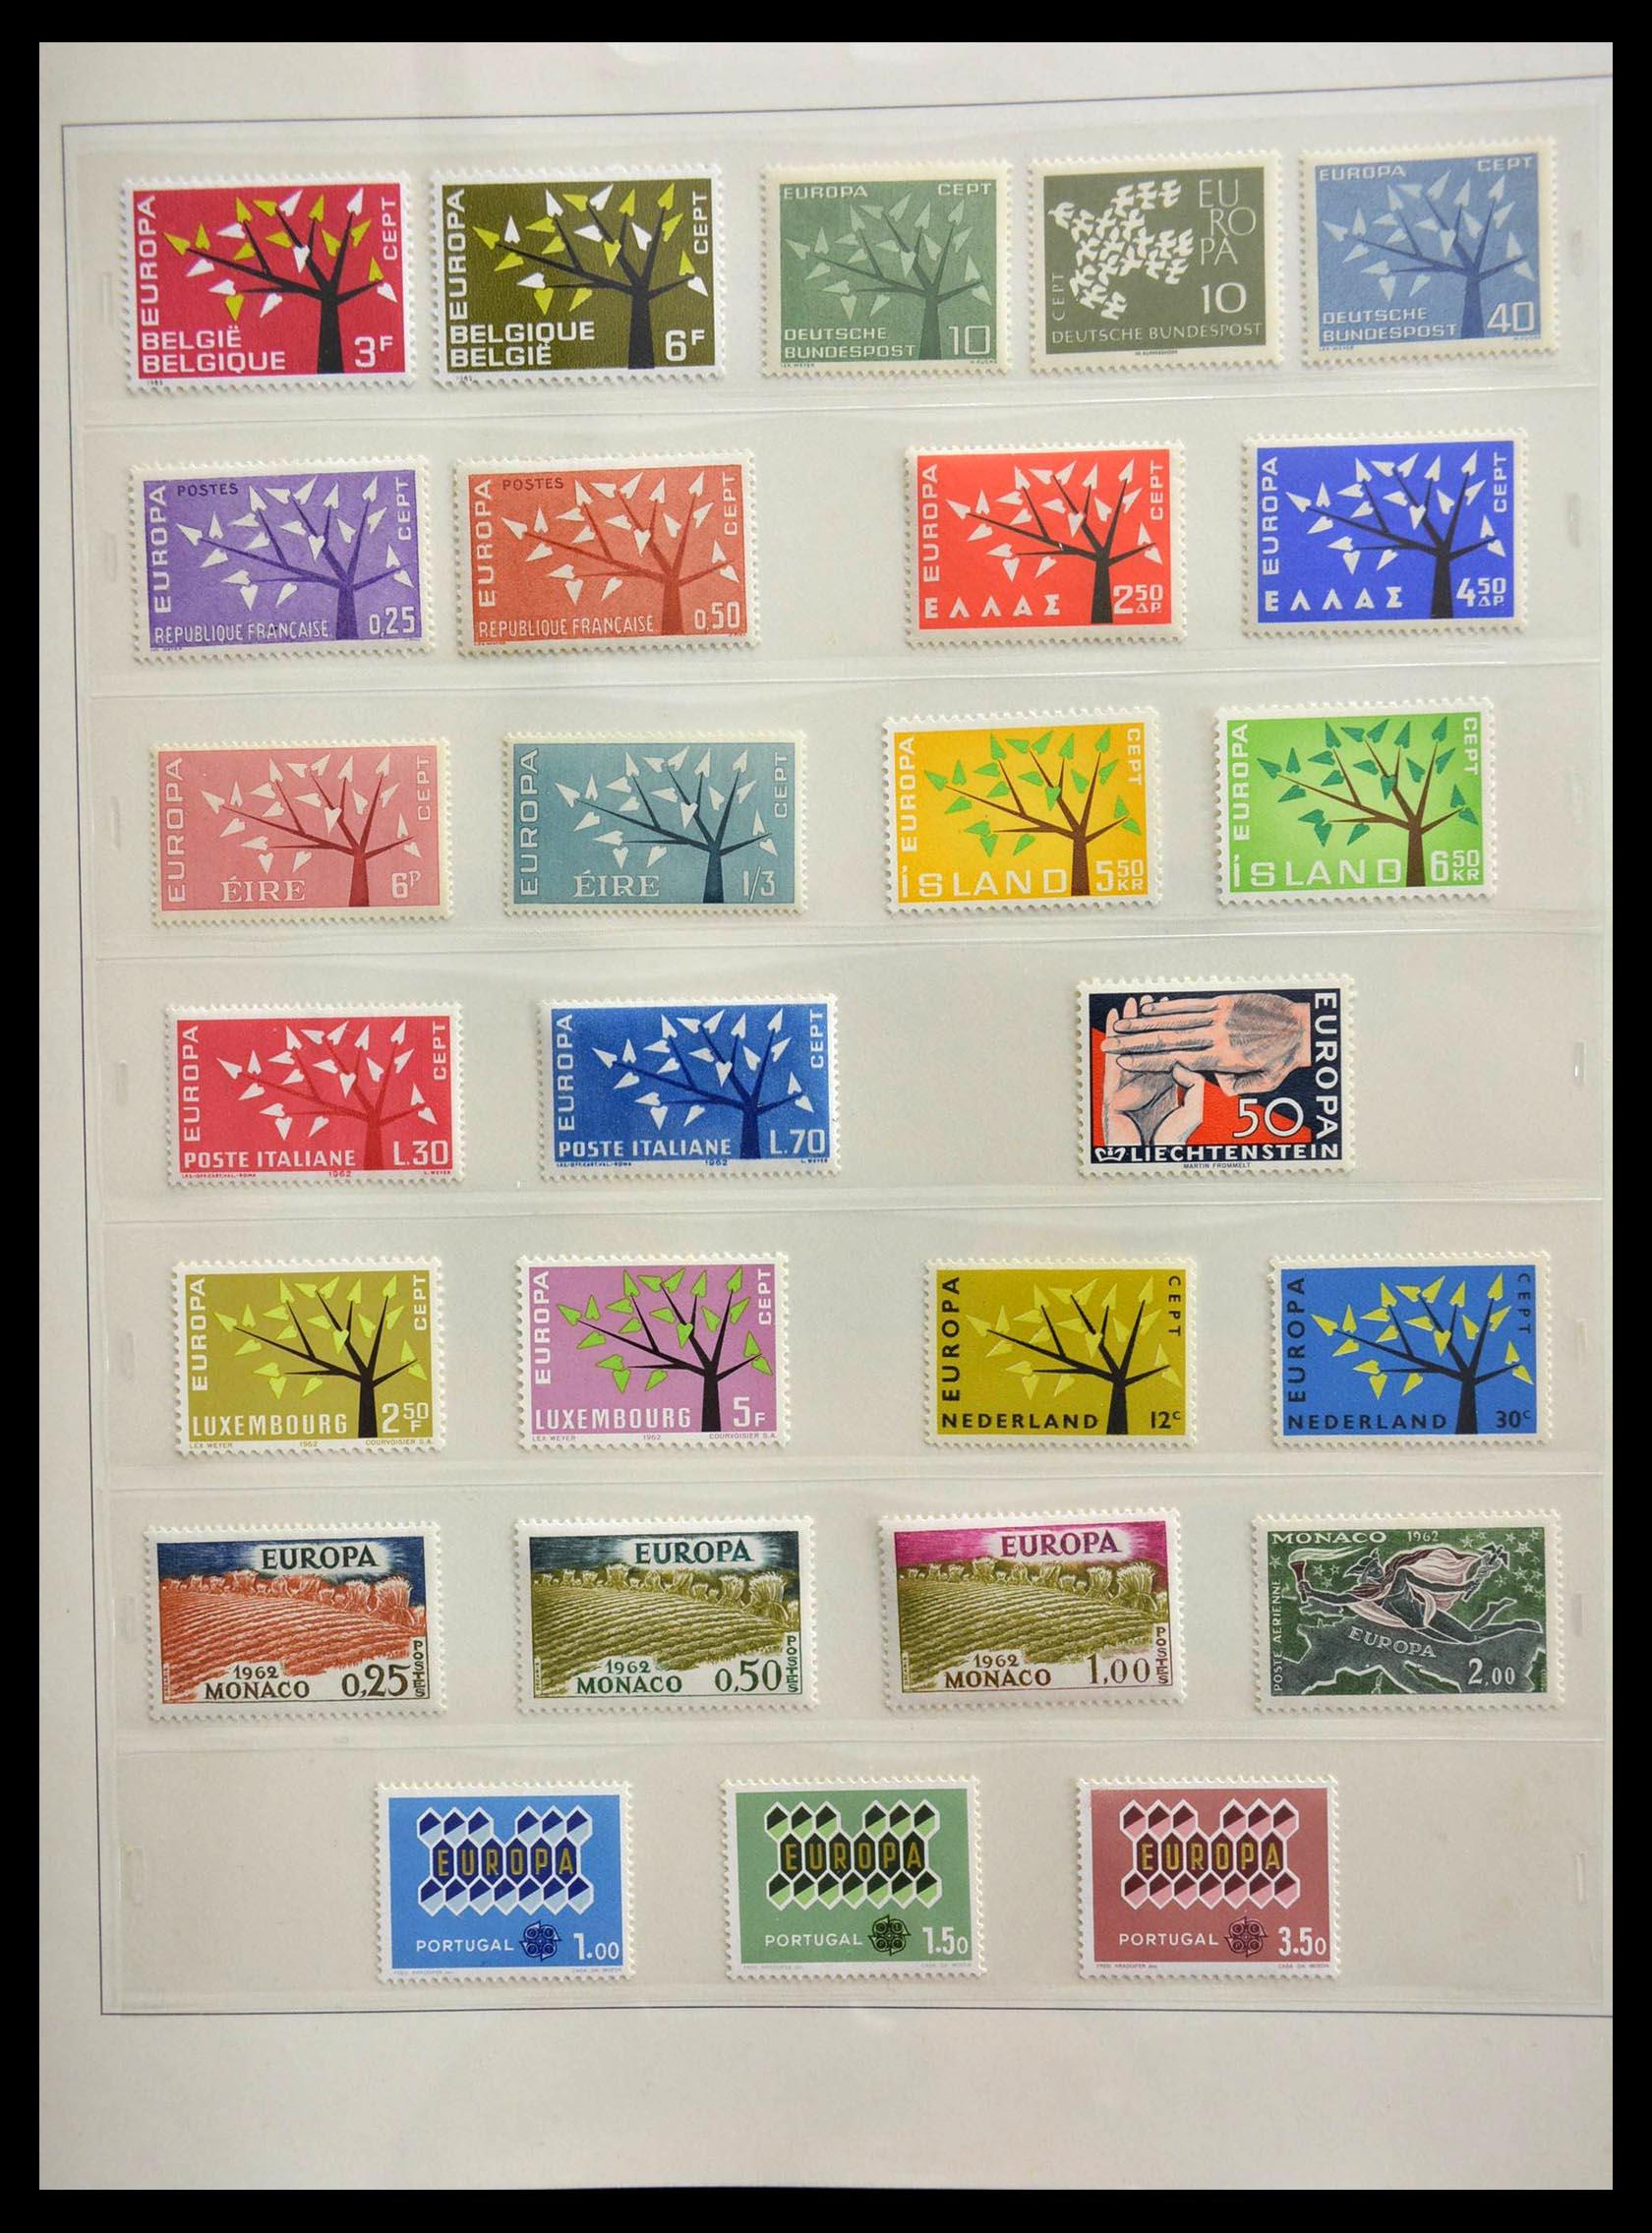 28637 009 - 28637 Europe Cept 1956-2000.